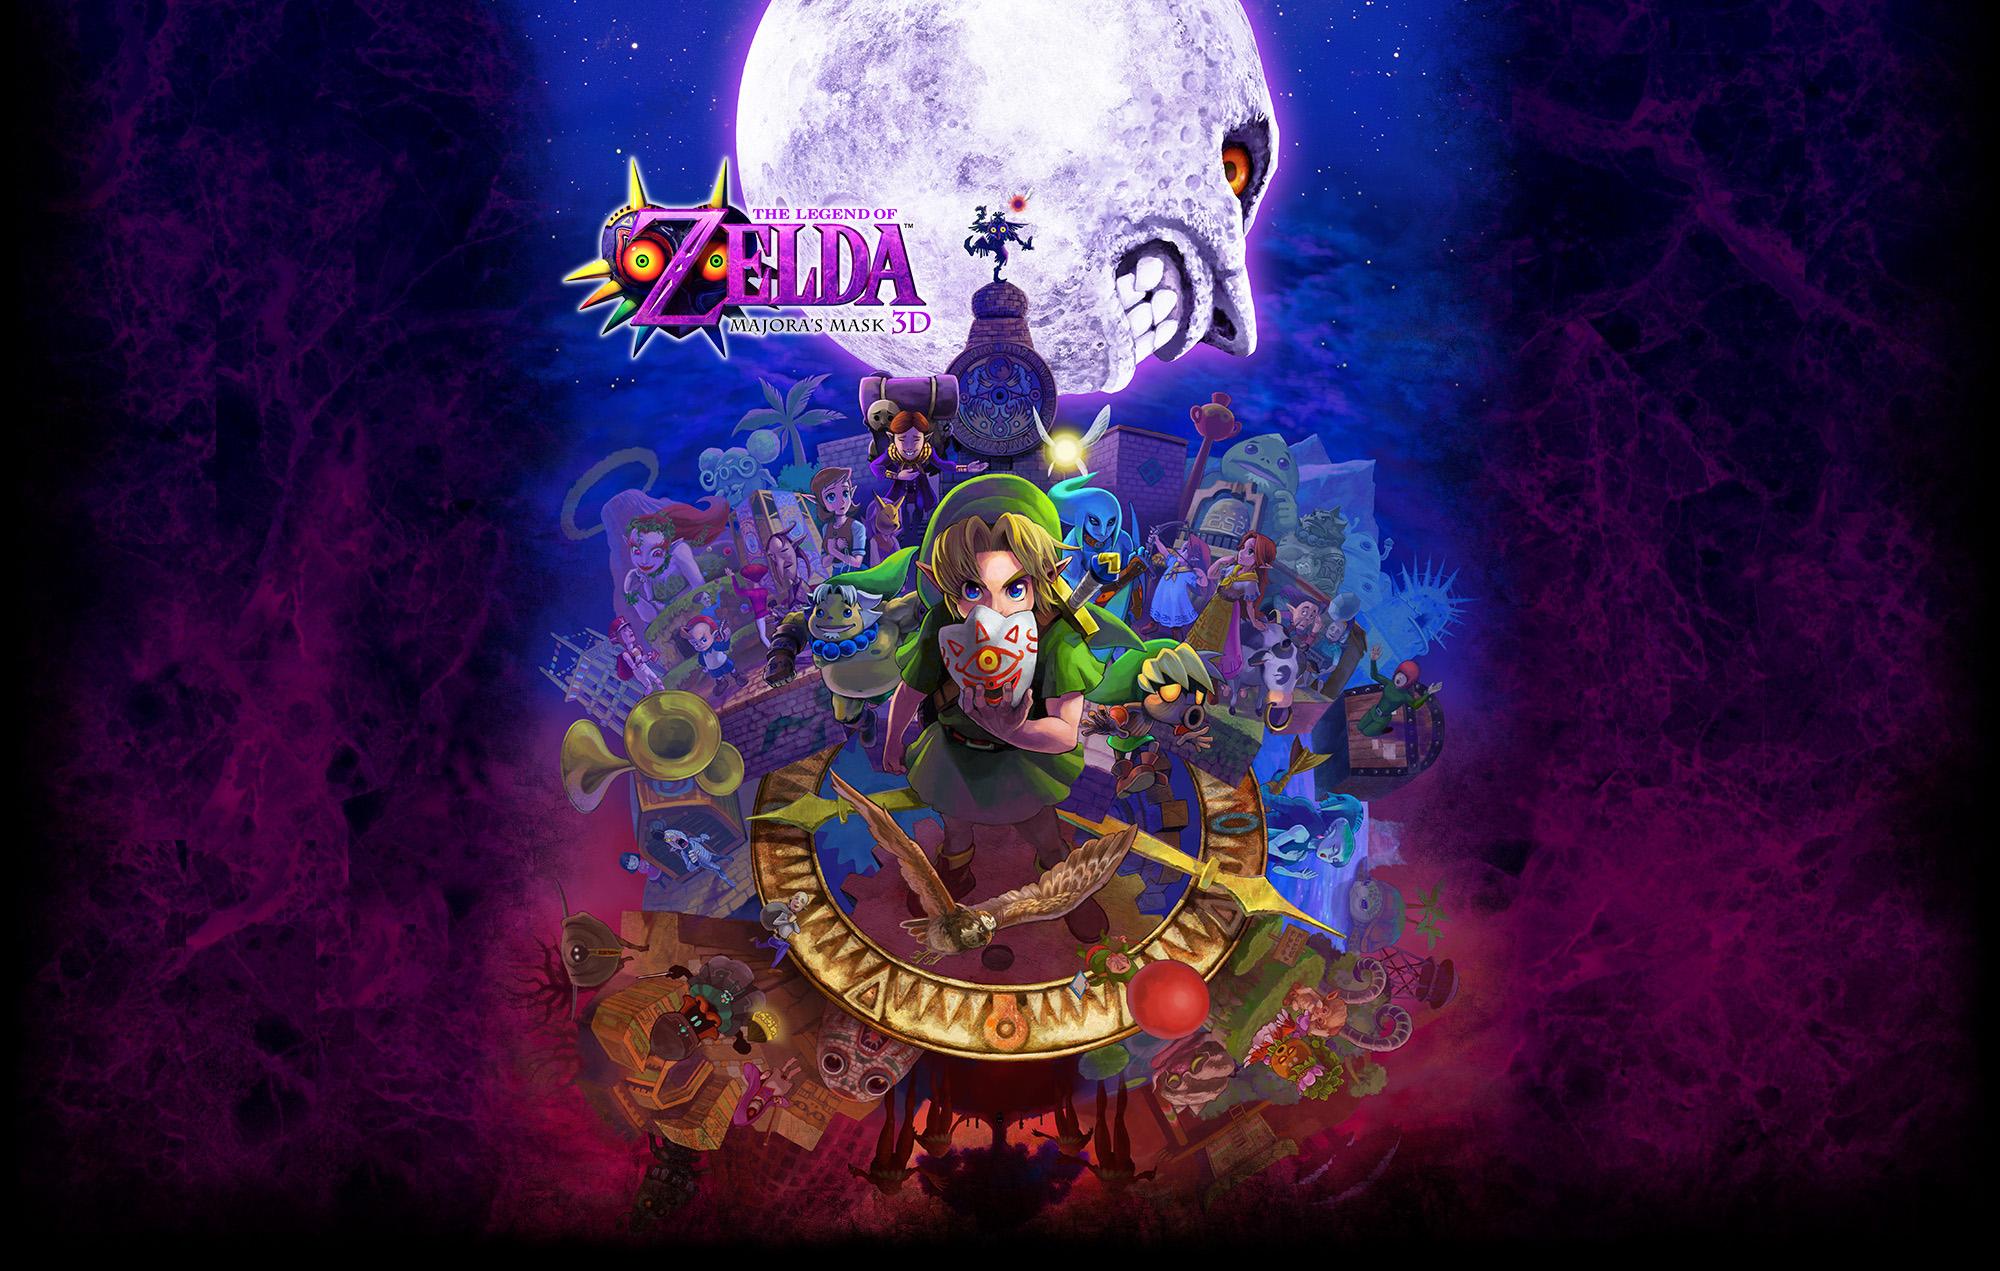 Free Download Of Zelda Majora S Mask 3d Seite Dieses Tolle